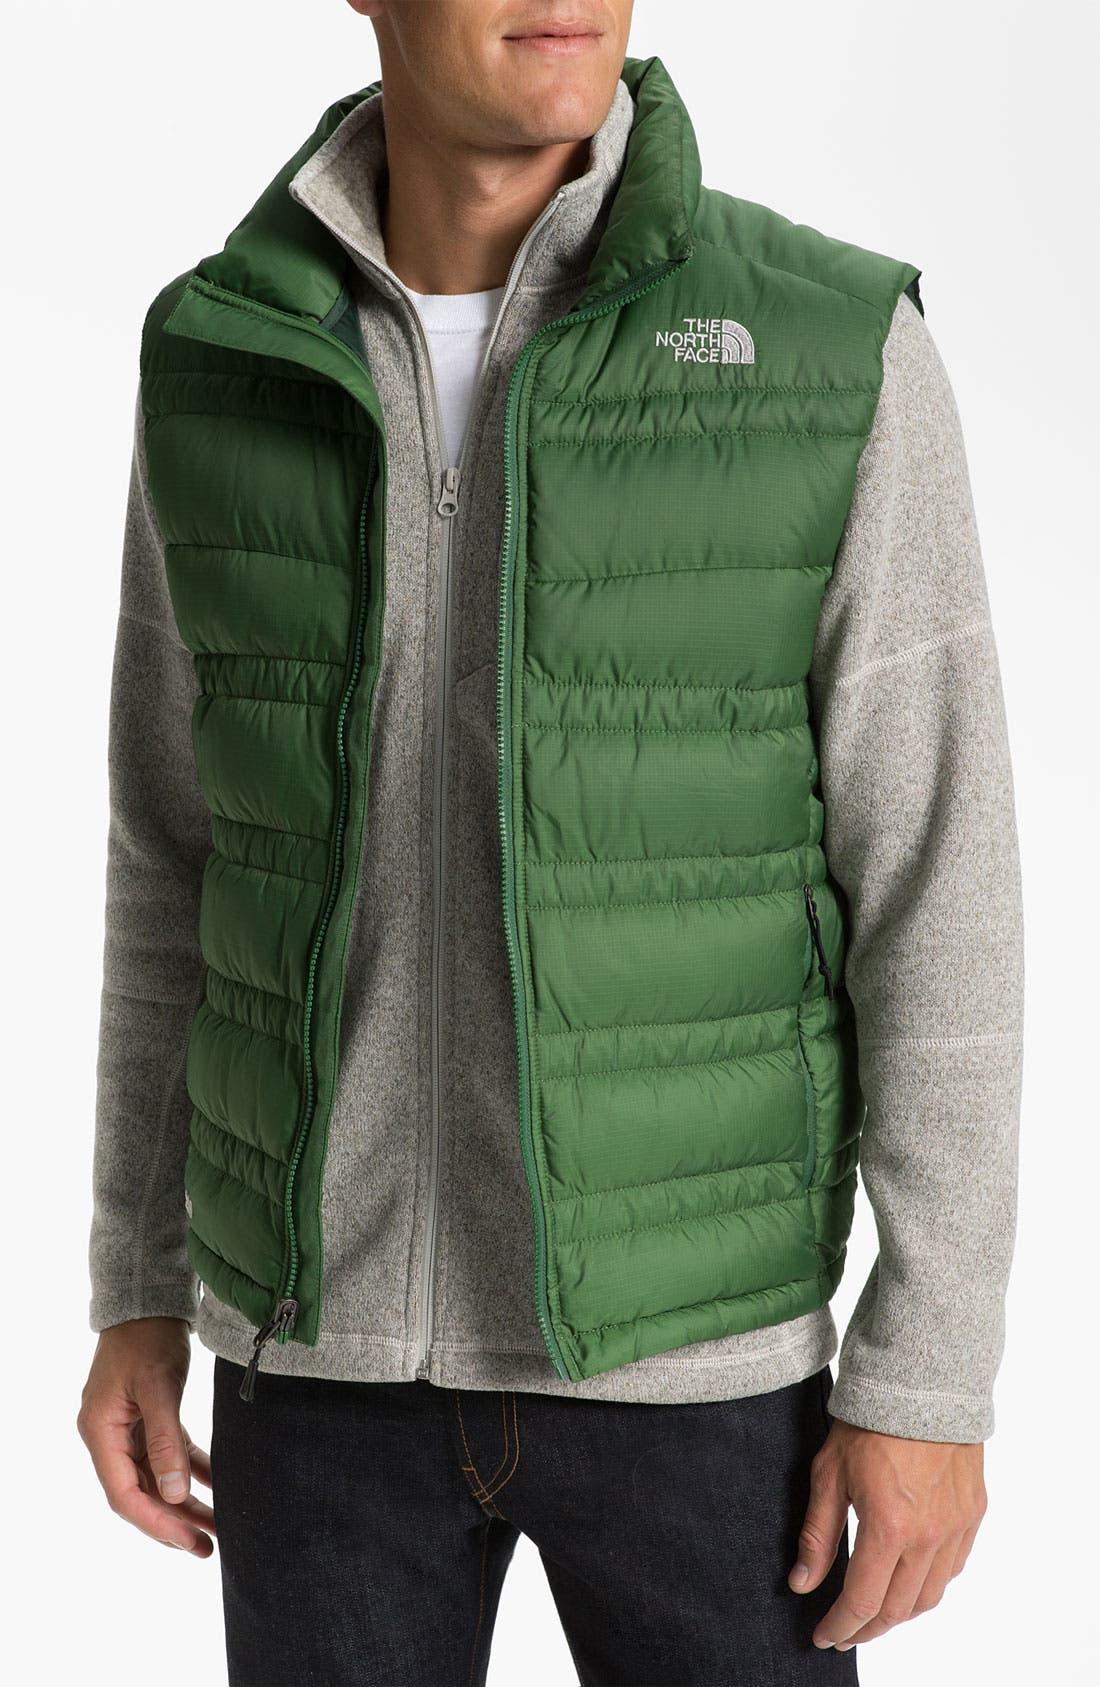 Main Image - The North Face 'Aconcagua' Vest